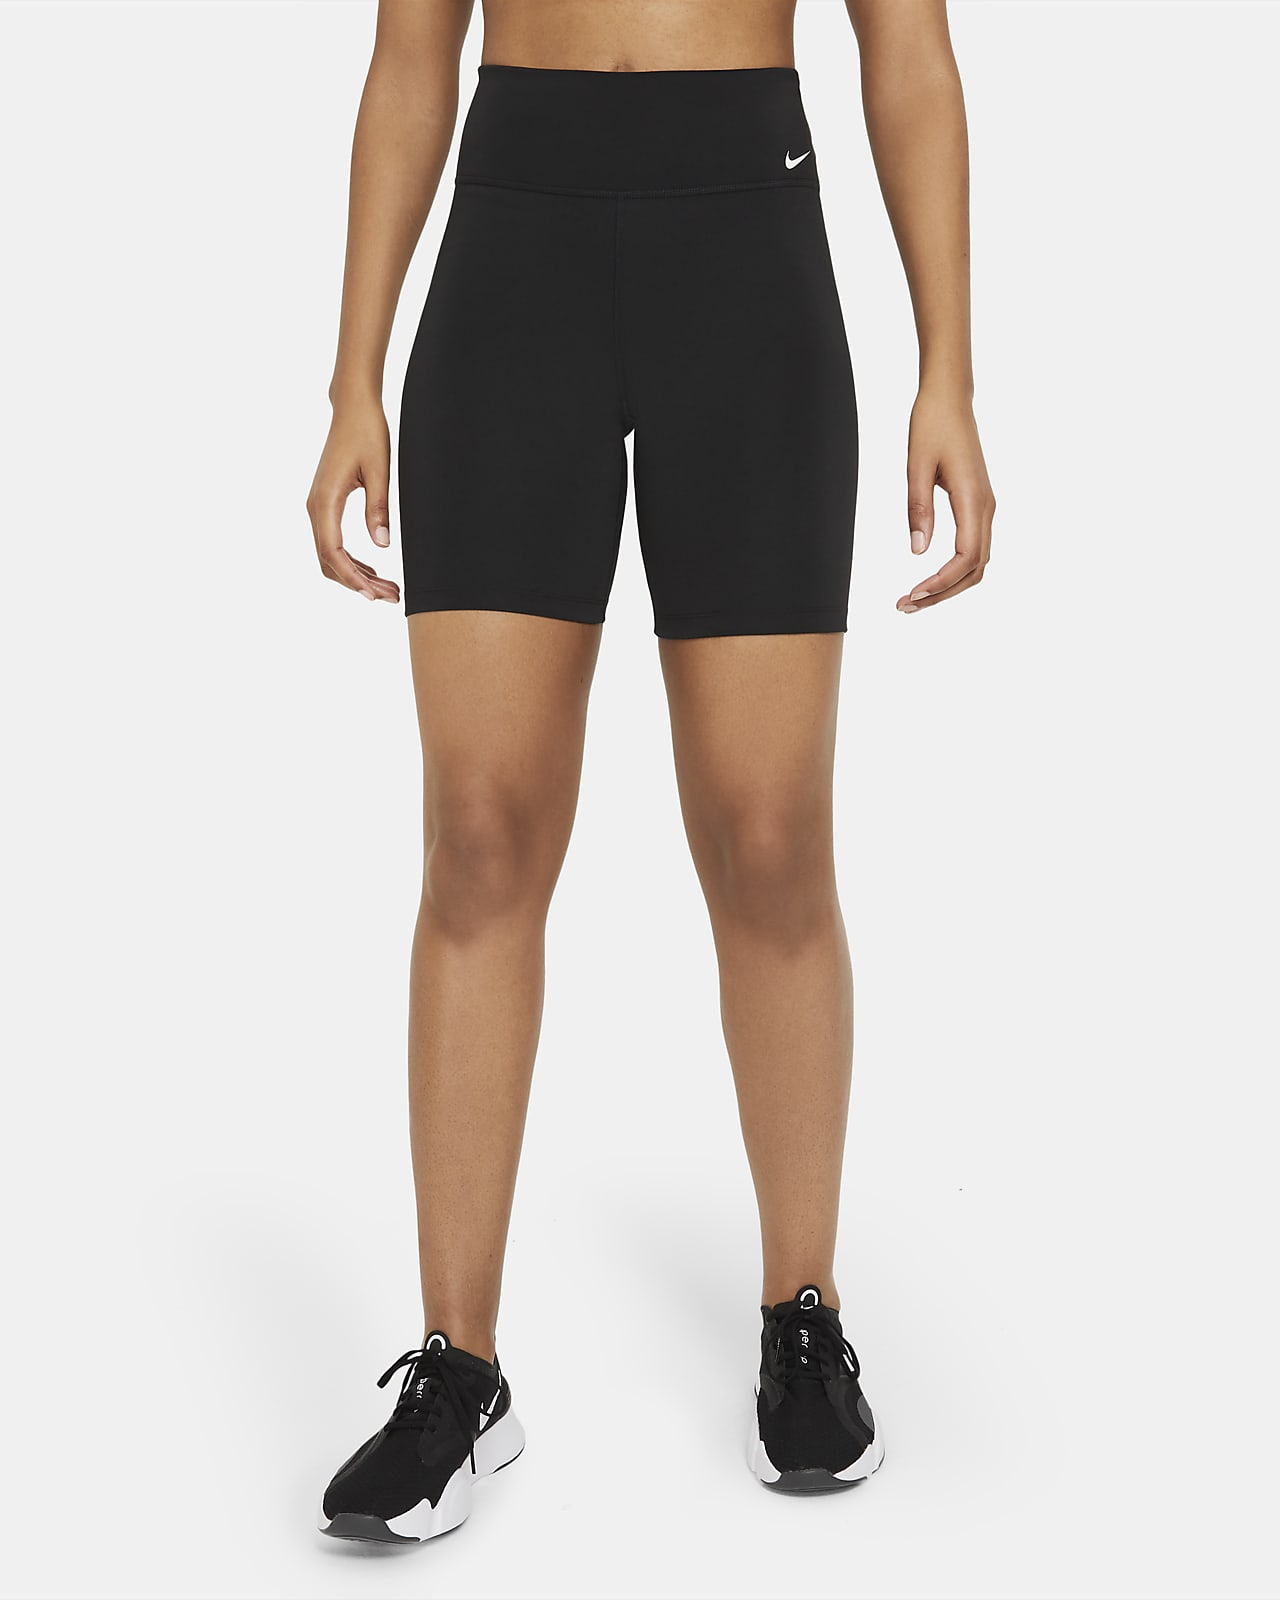 Short taille mi-basse Nike One 18 cm pour Femme